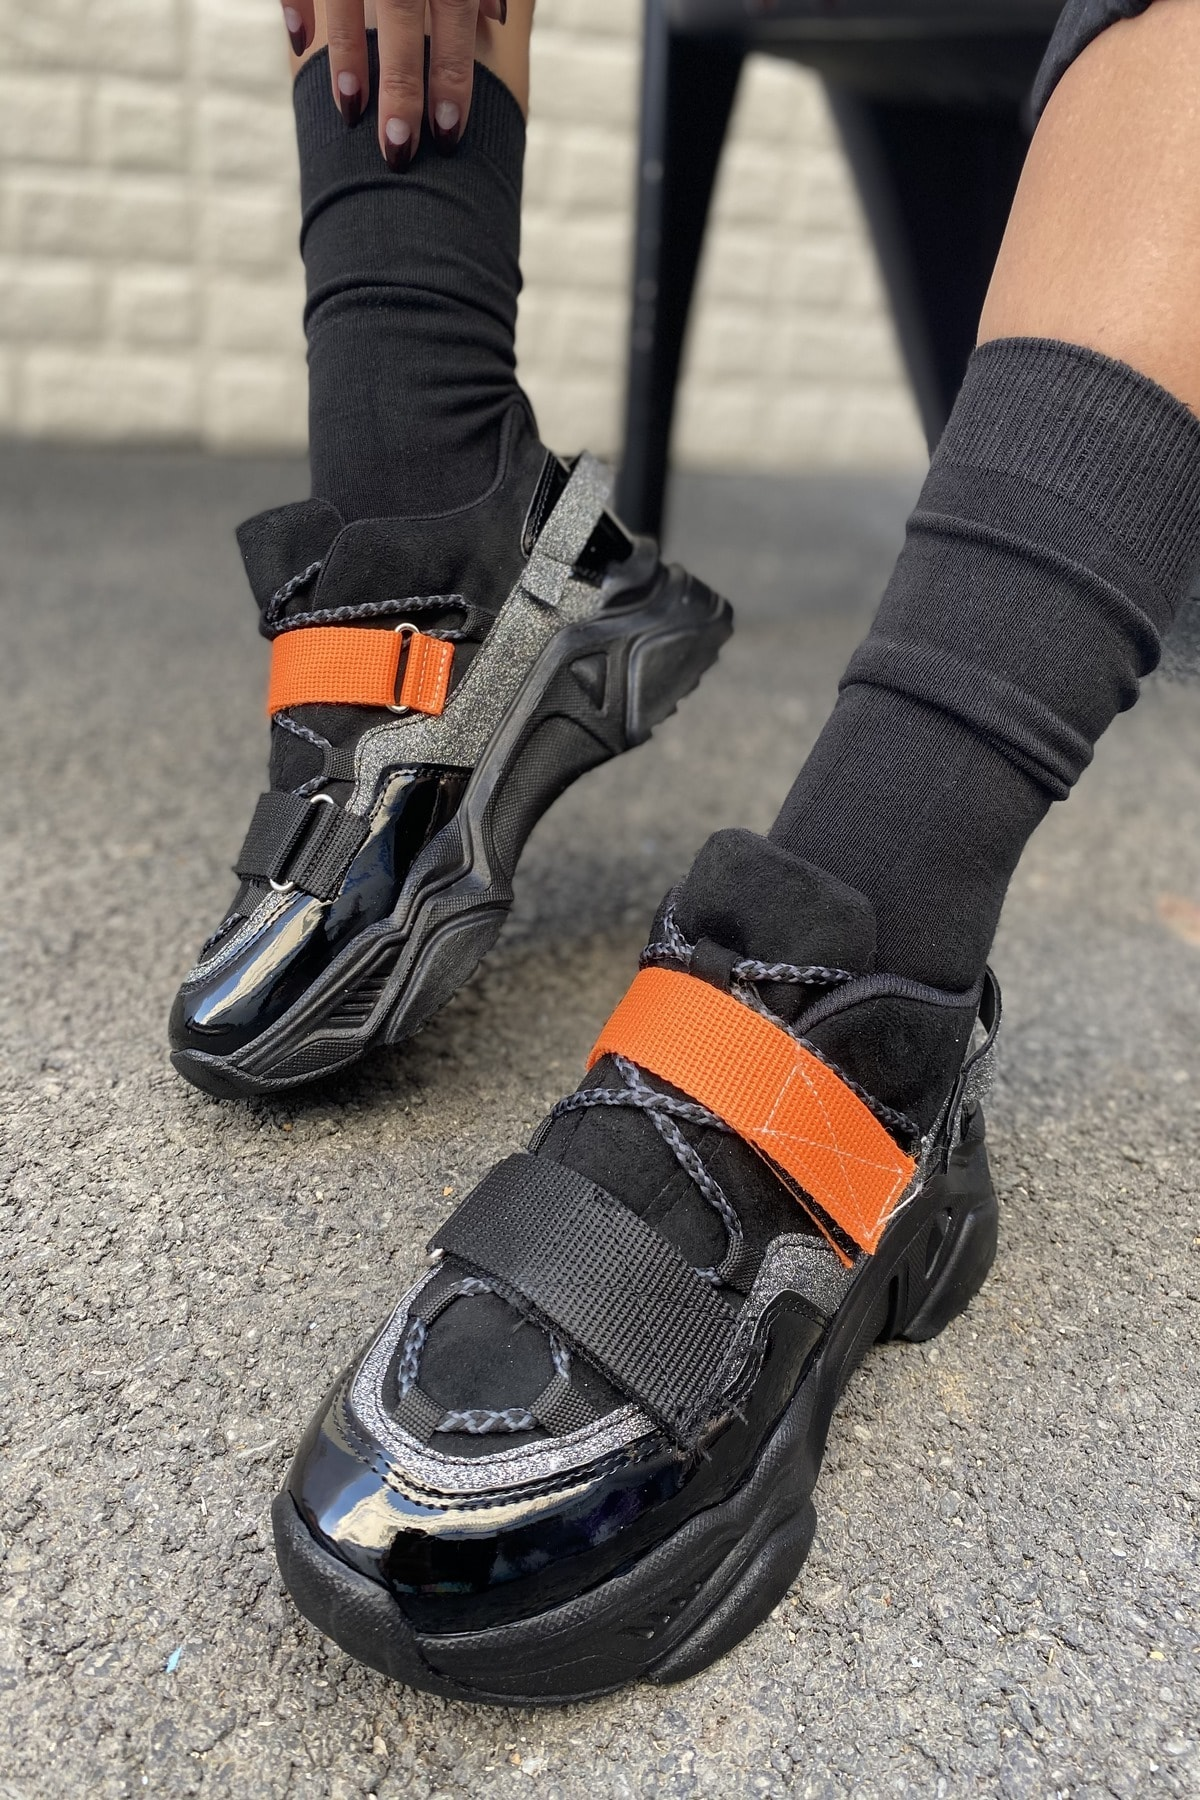 Kadın Siyah&Turuncu Ayakkabı&Sneaker INASPORT10